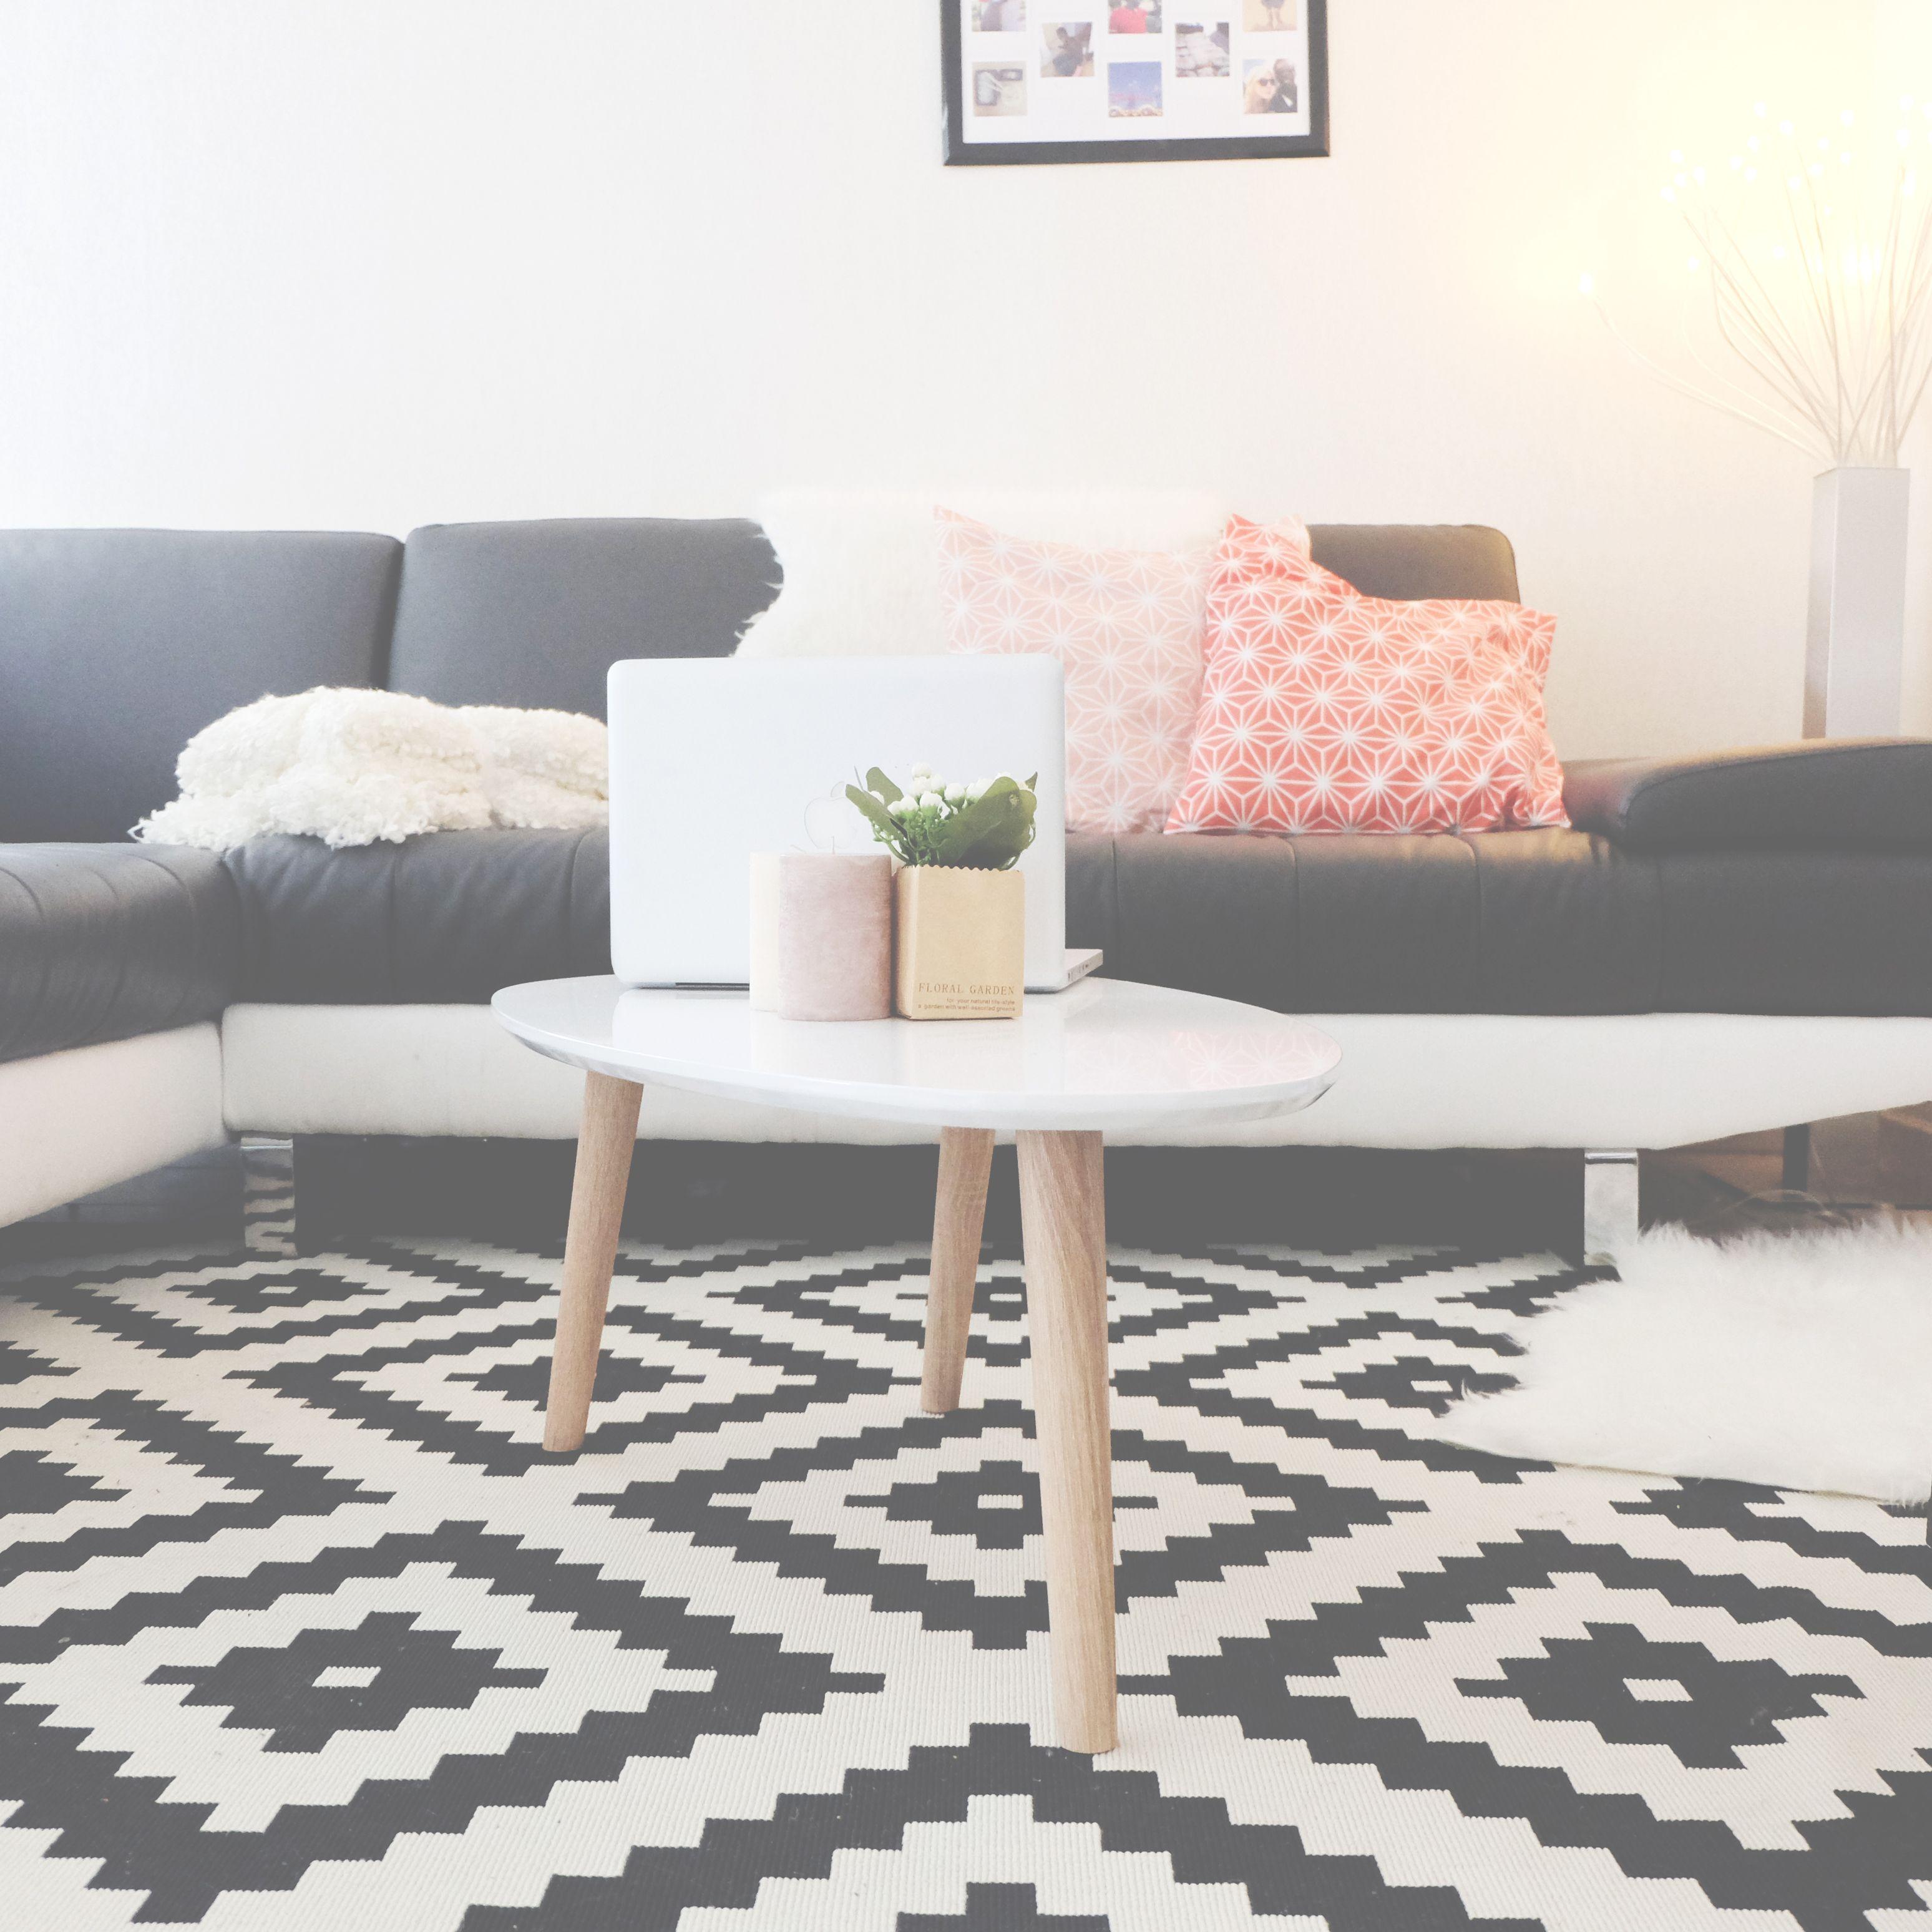 Inspirant Tapis Salon Ikea Decoration Francaise Rugs In